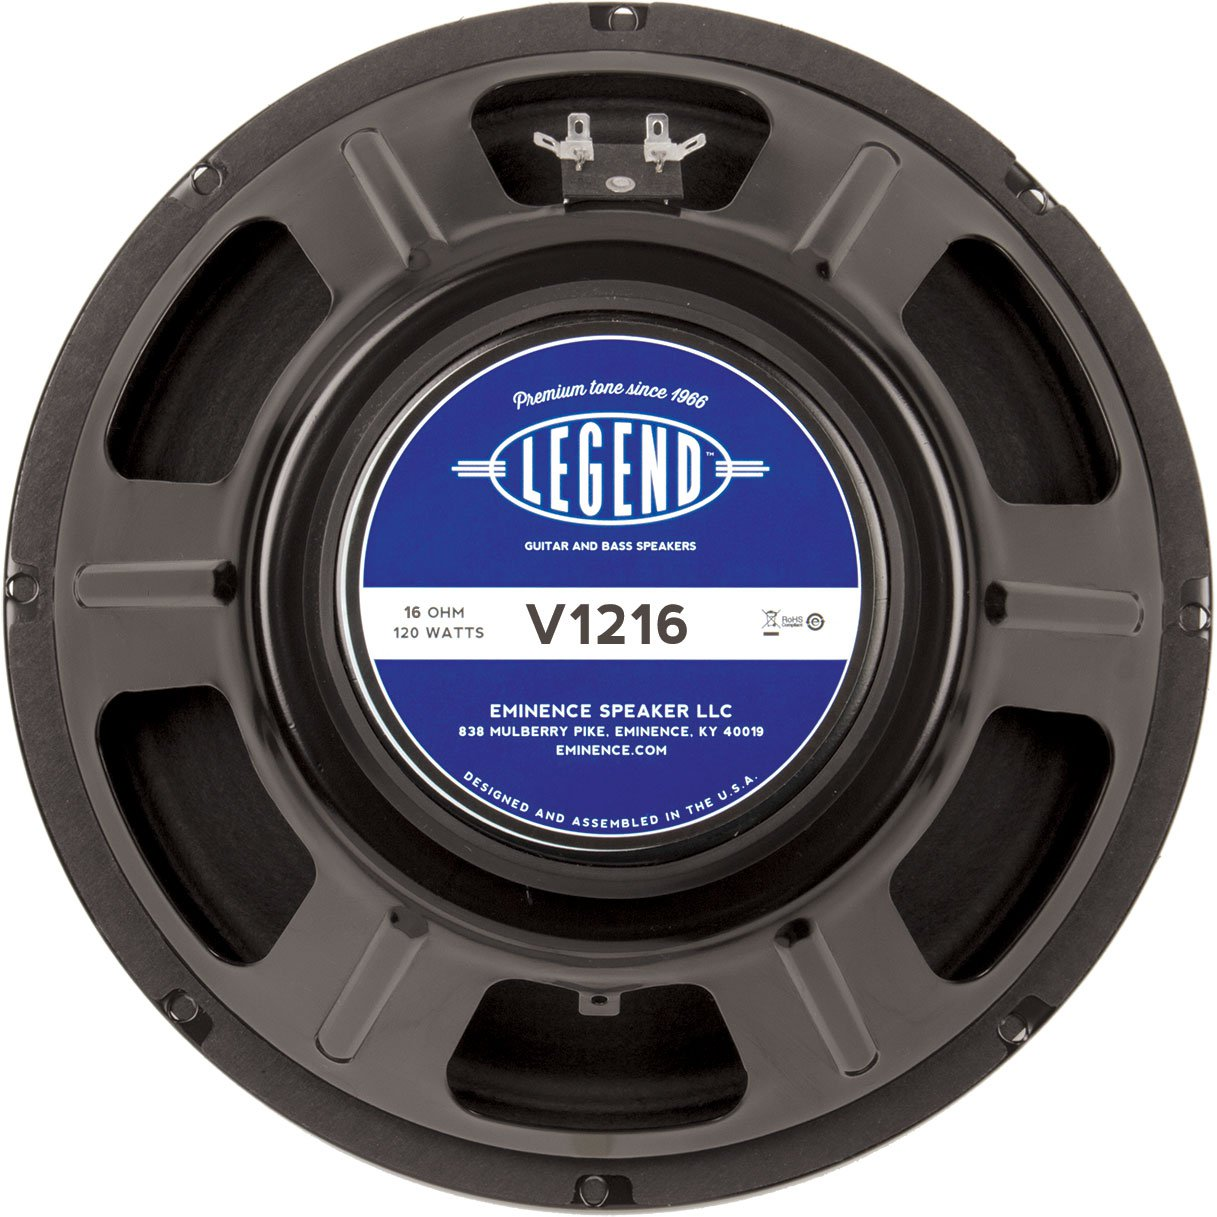 "Eminence Legend V1216 12"" Guitar Speaker 120W 16Ohm"